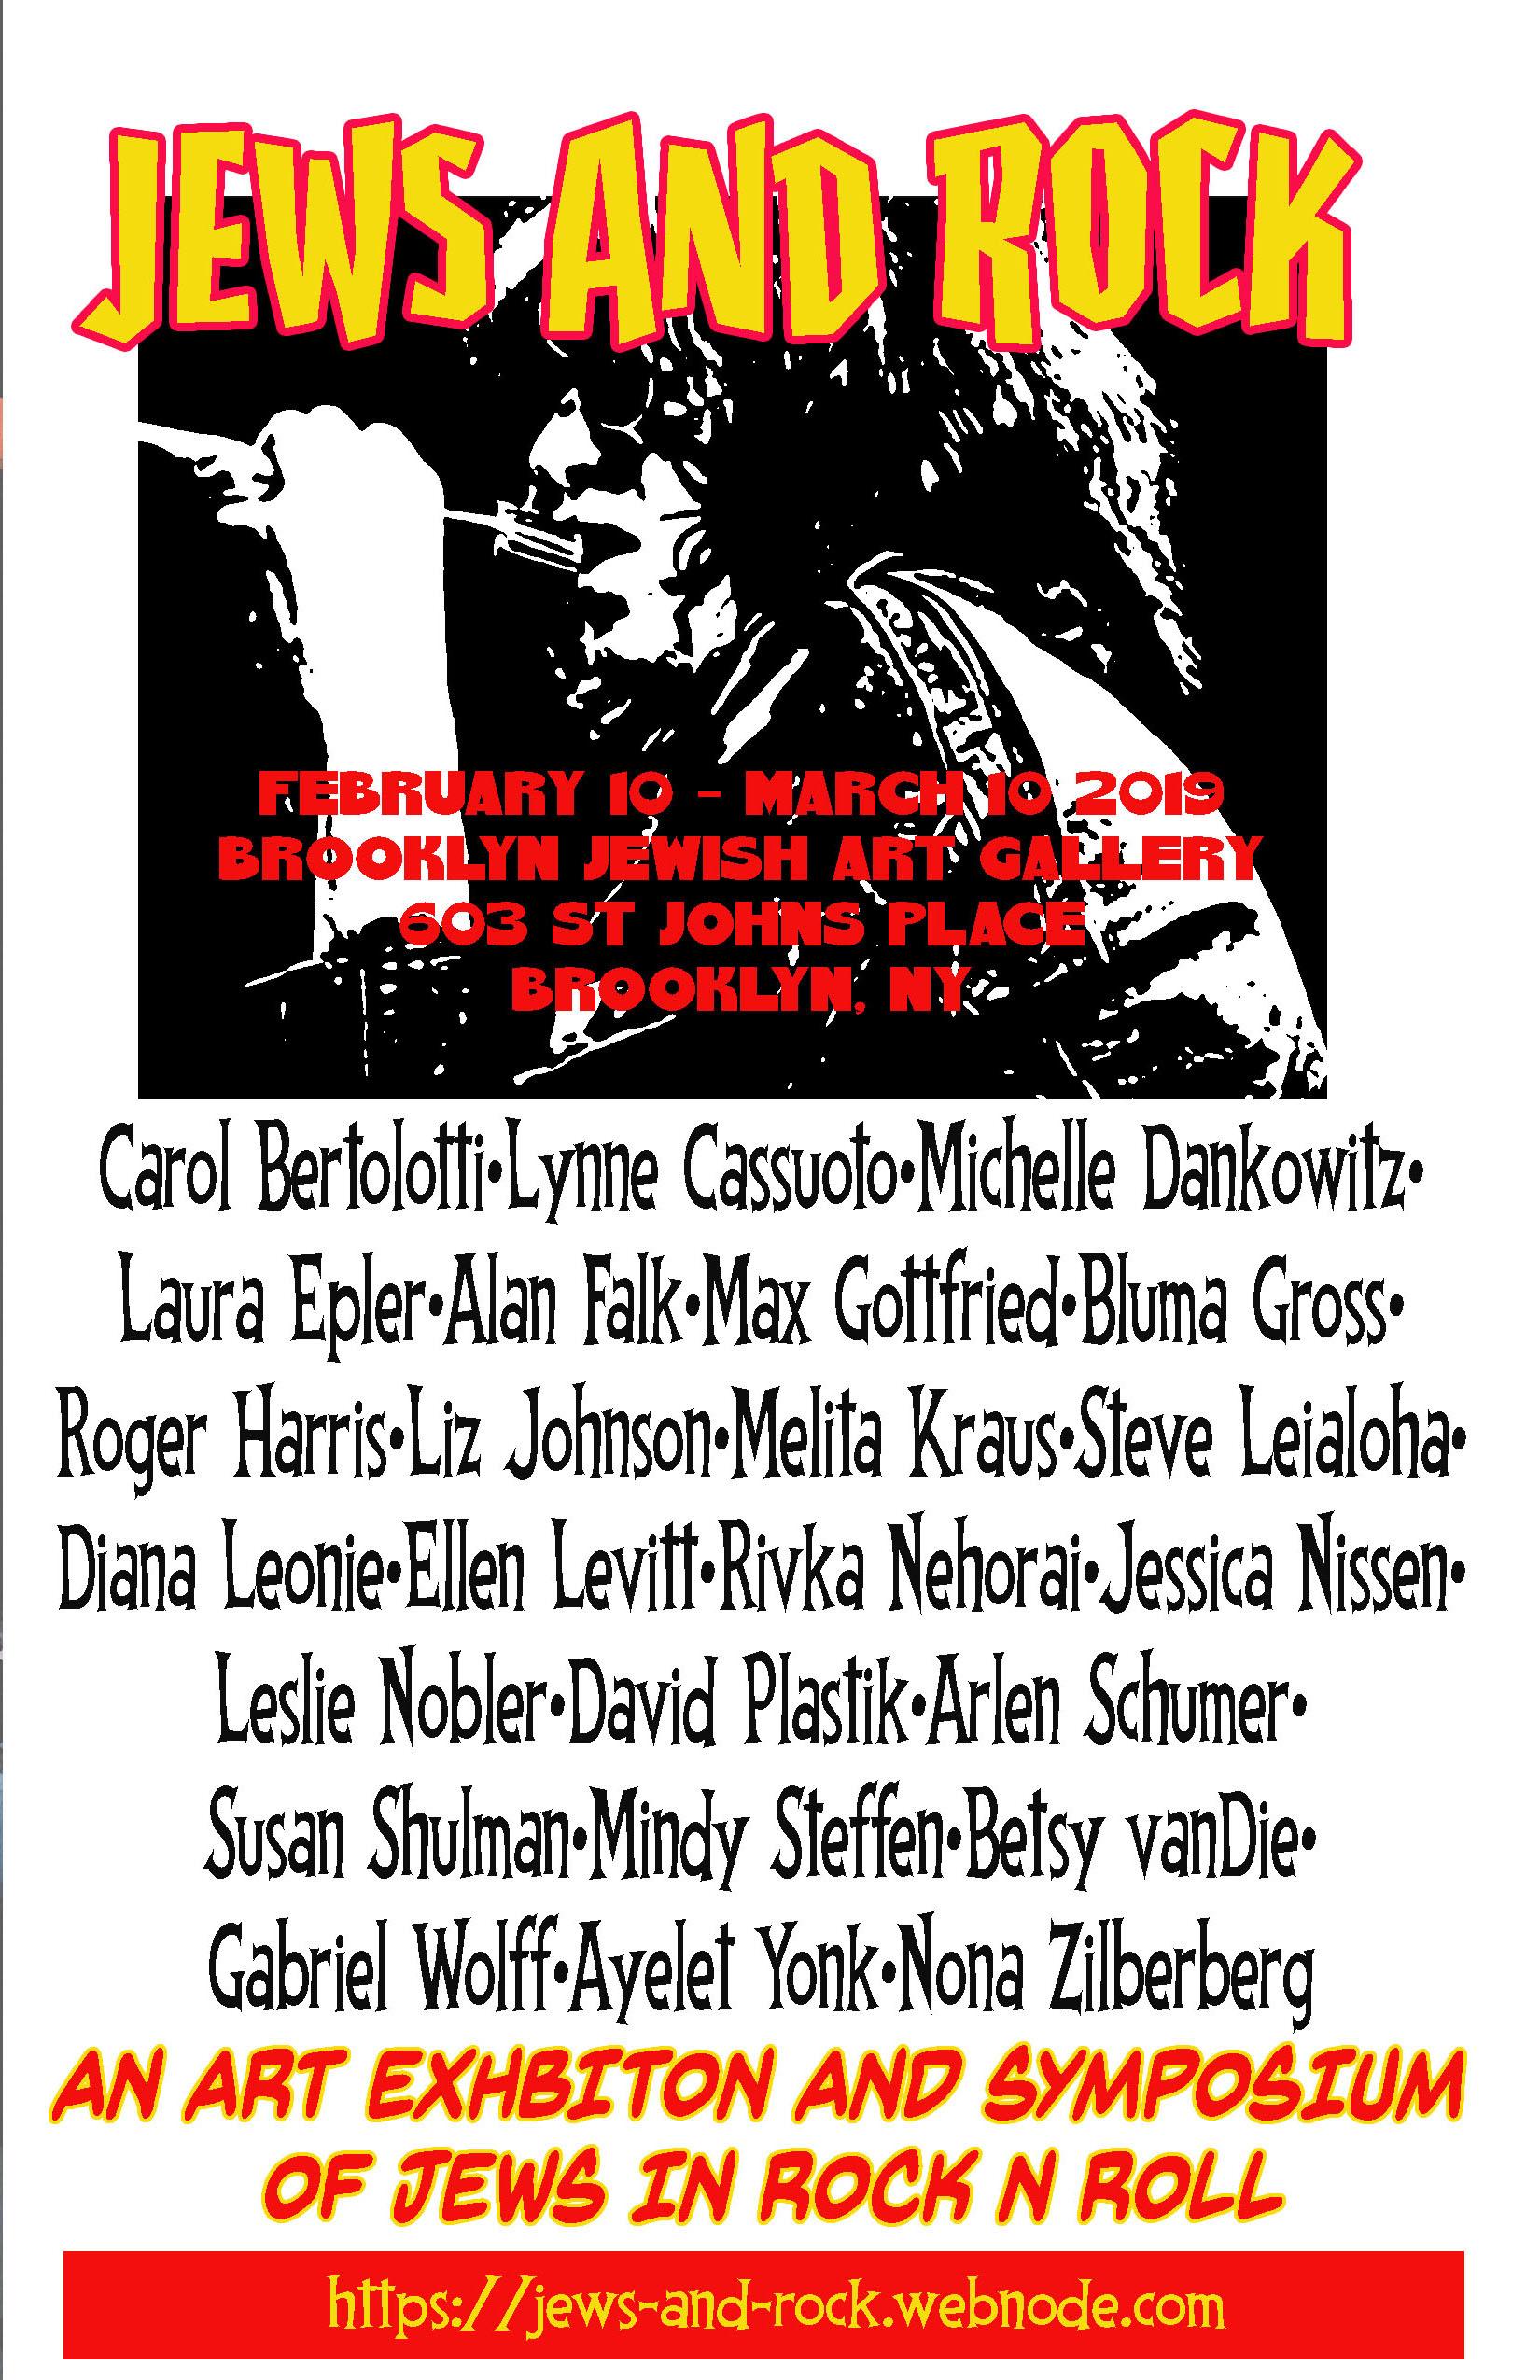 jews and rock brochure cover.jpg